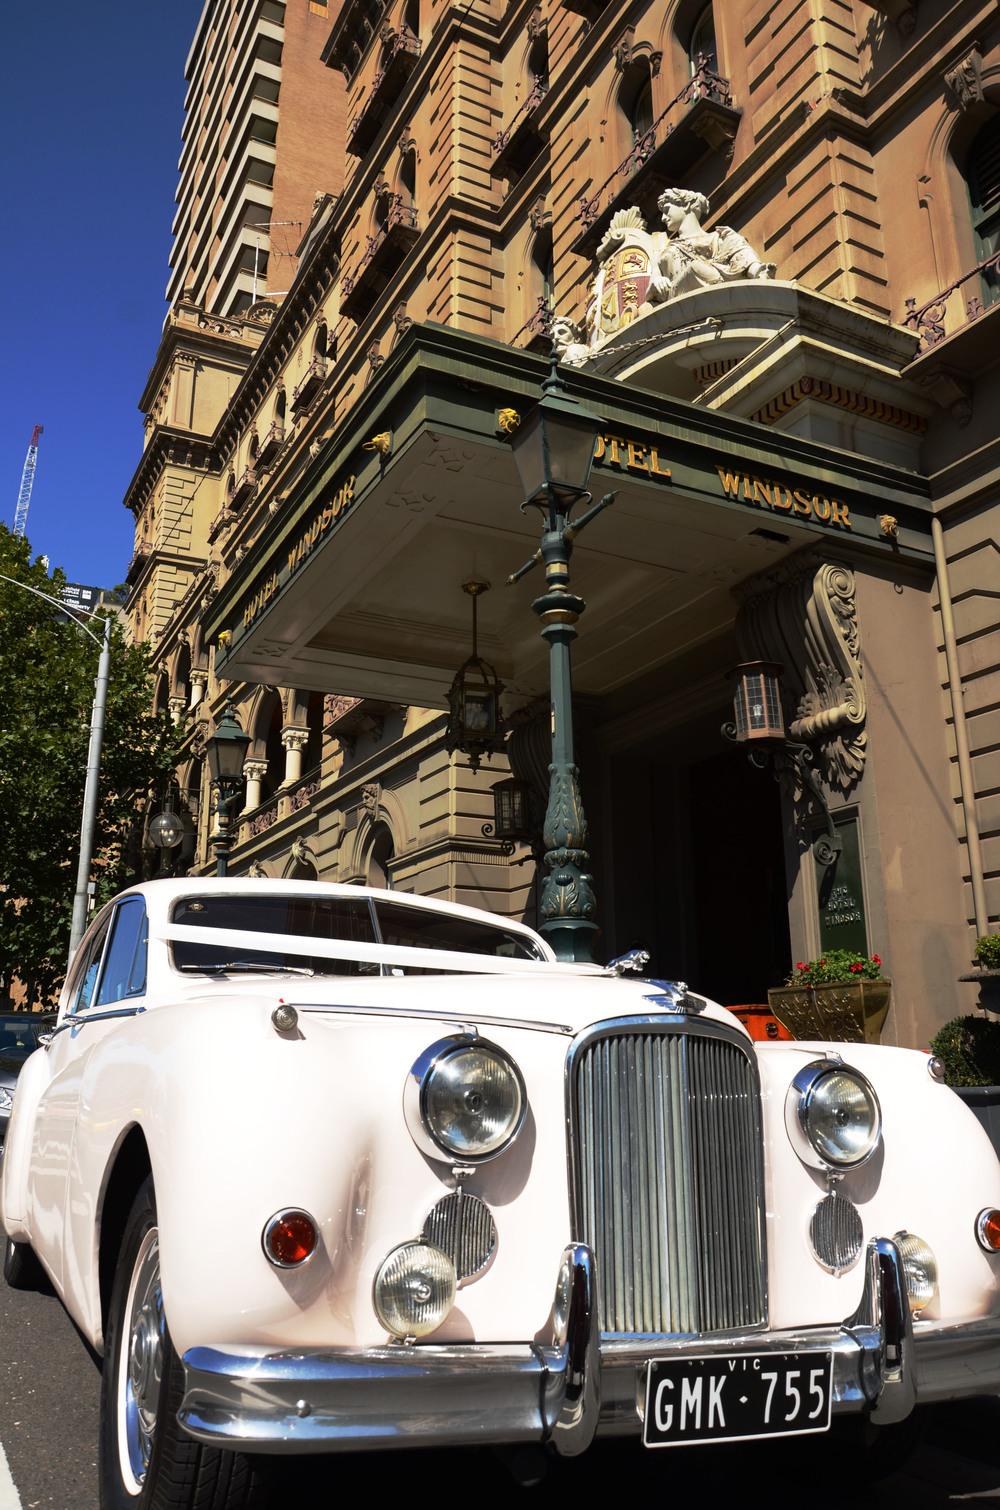 hotelwindsor.jpg